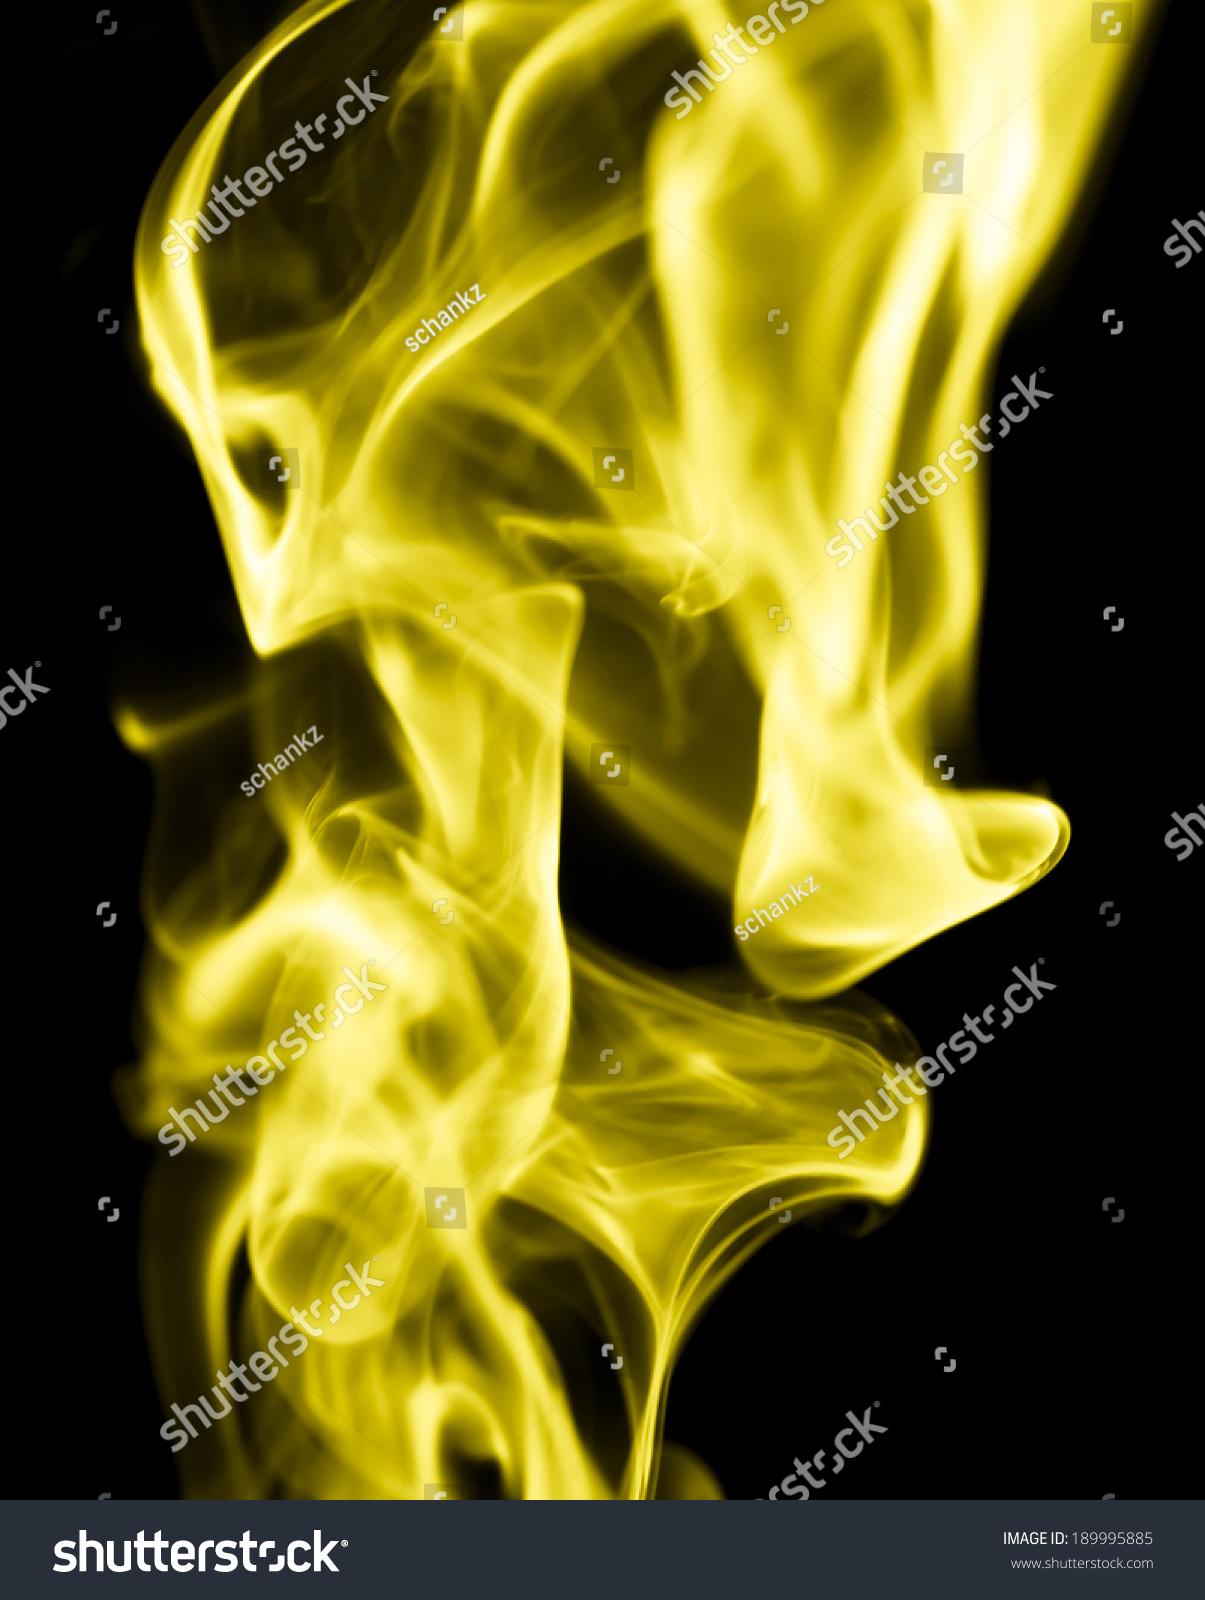 Yellow smoke photo